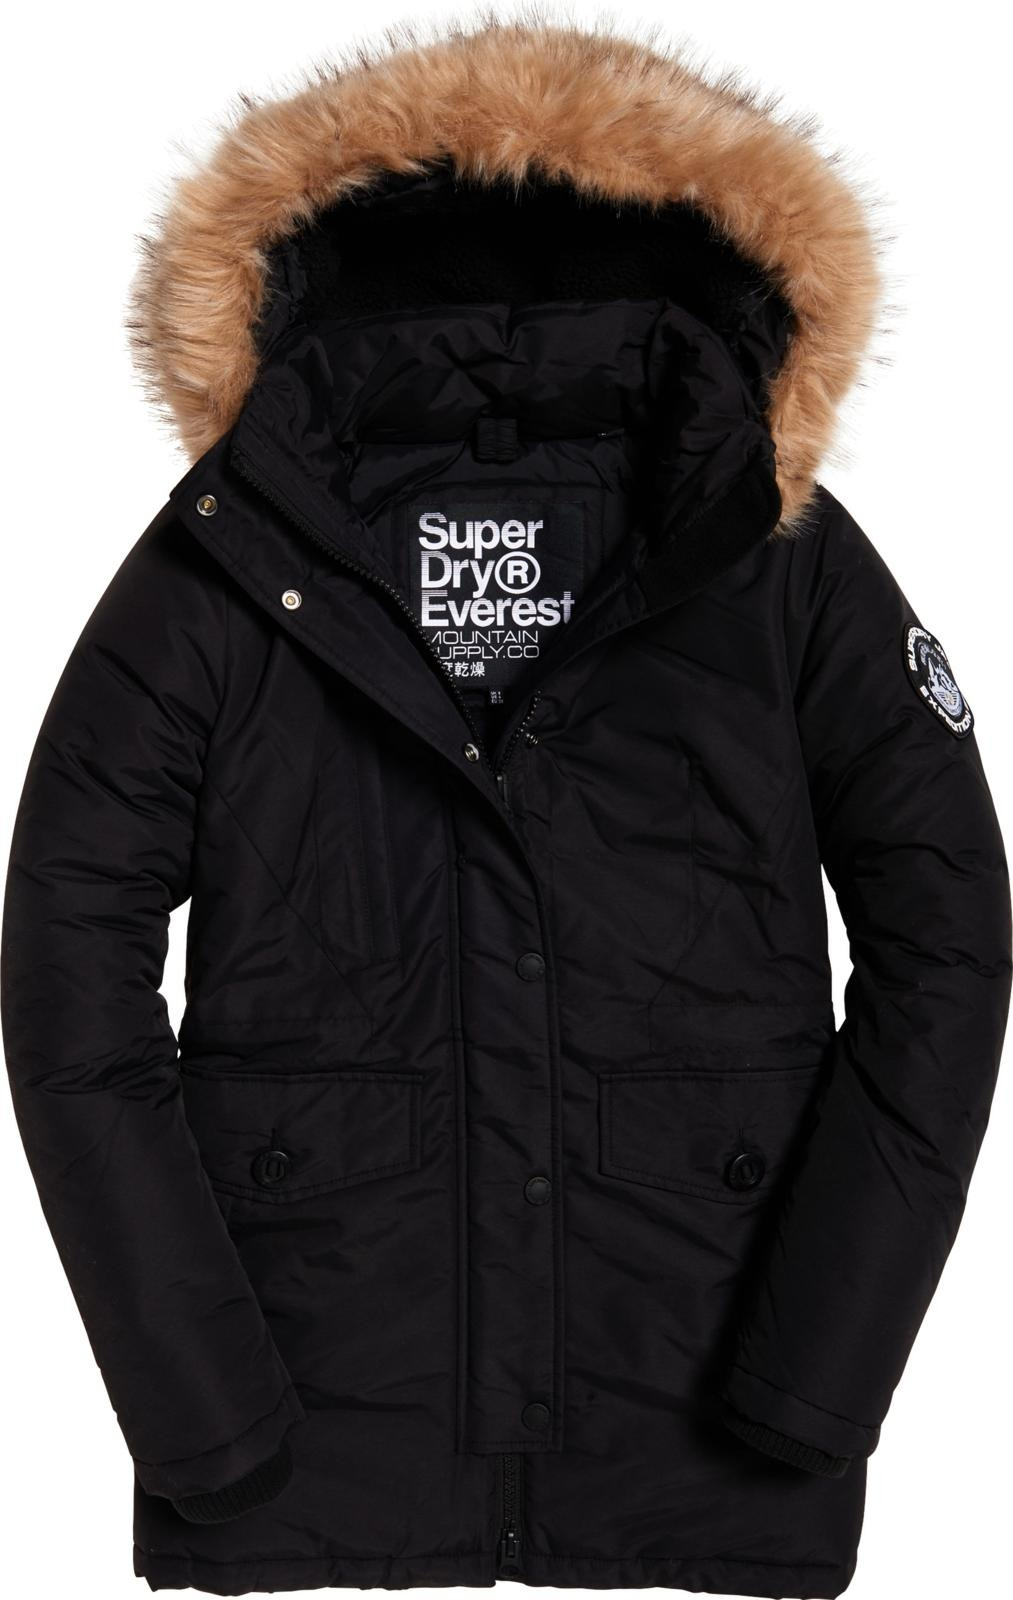 Kiva softshell takki Everest – Naiset | Rekki